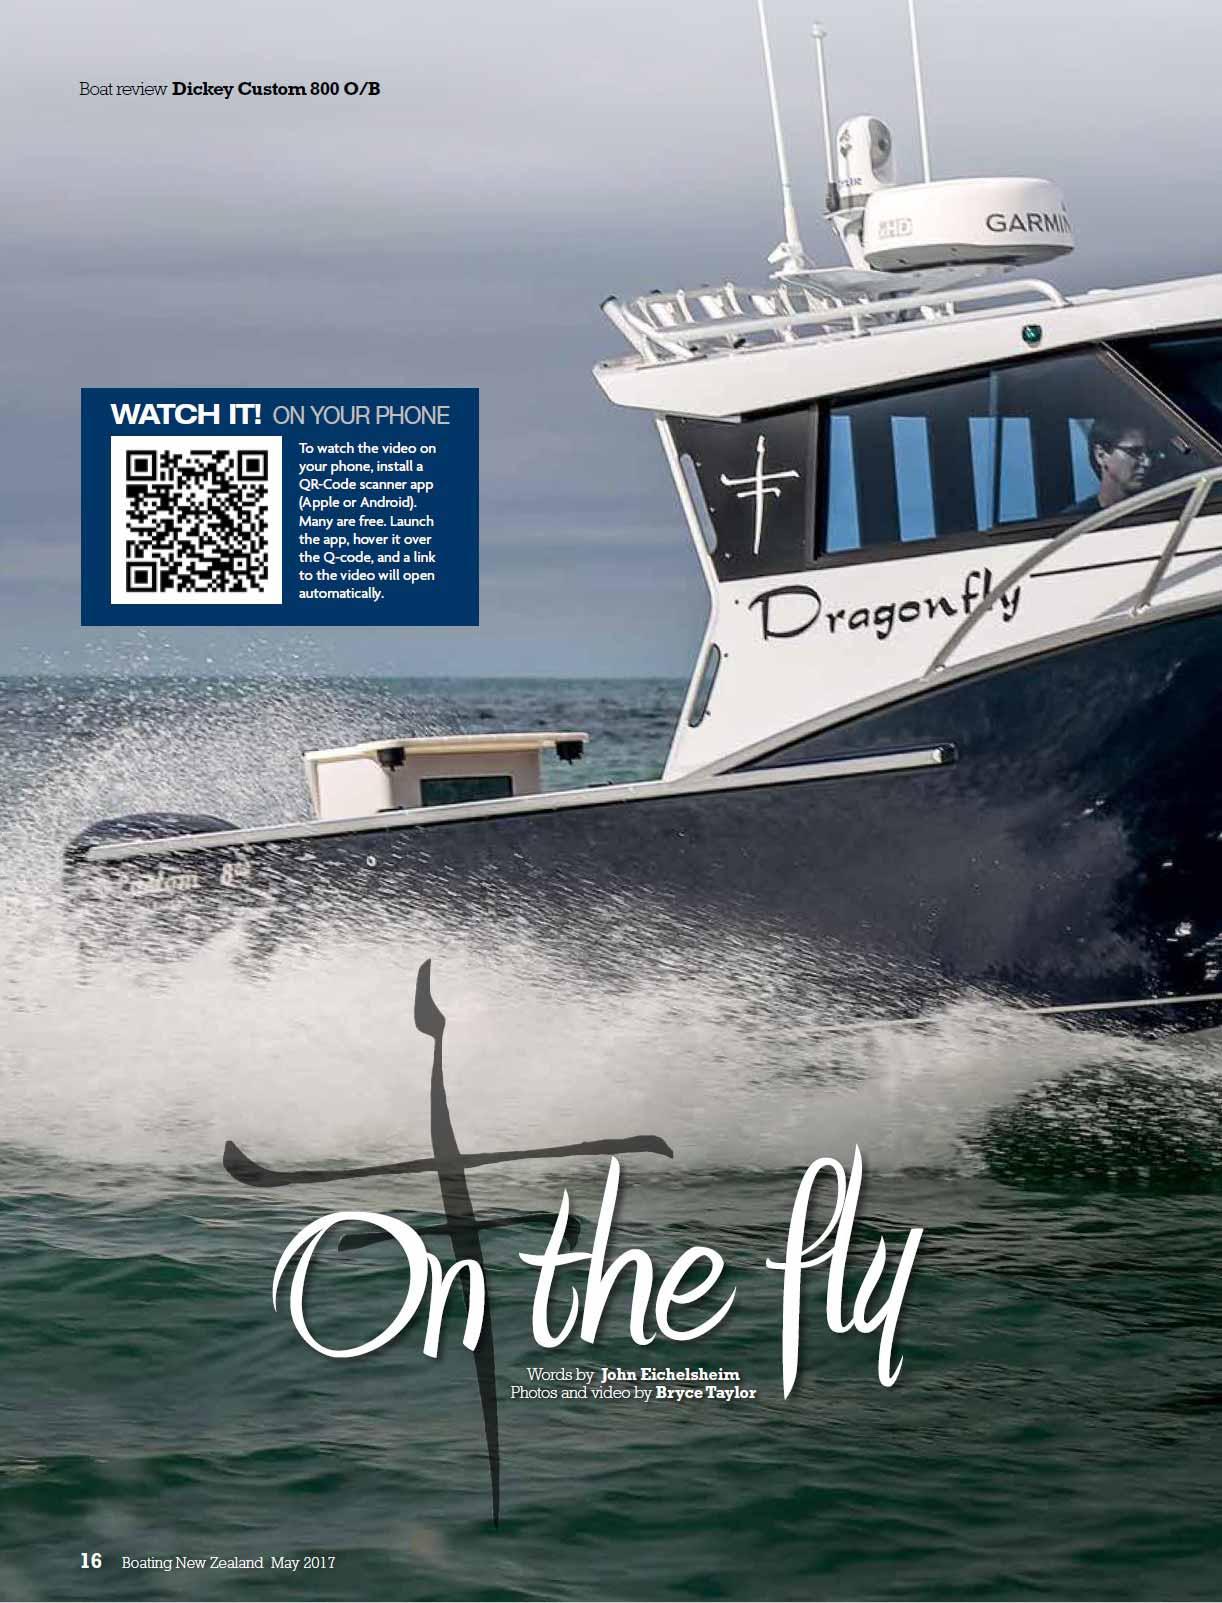 Dickey Boats Custom 800 review - Boating New Zealand (2017)